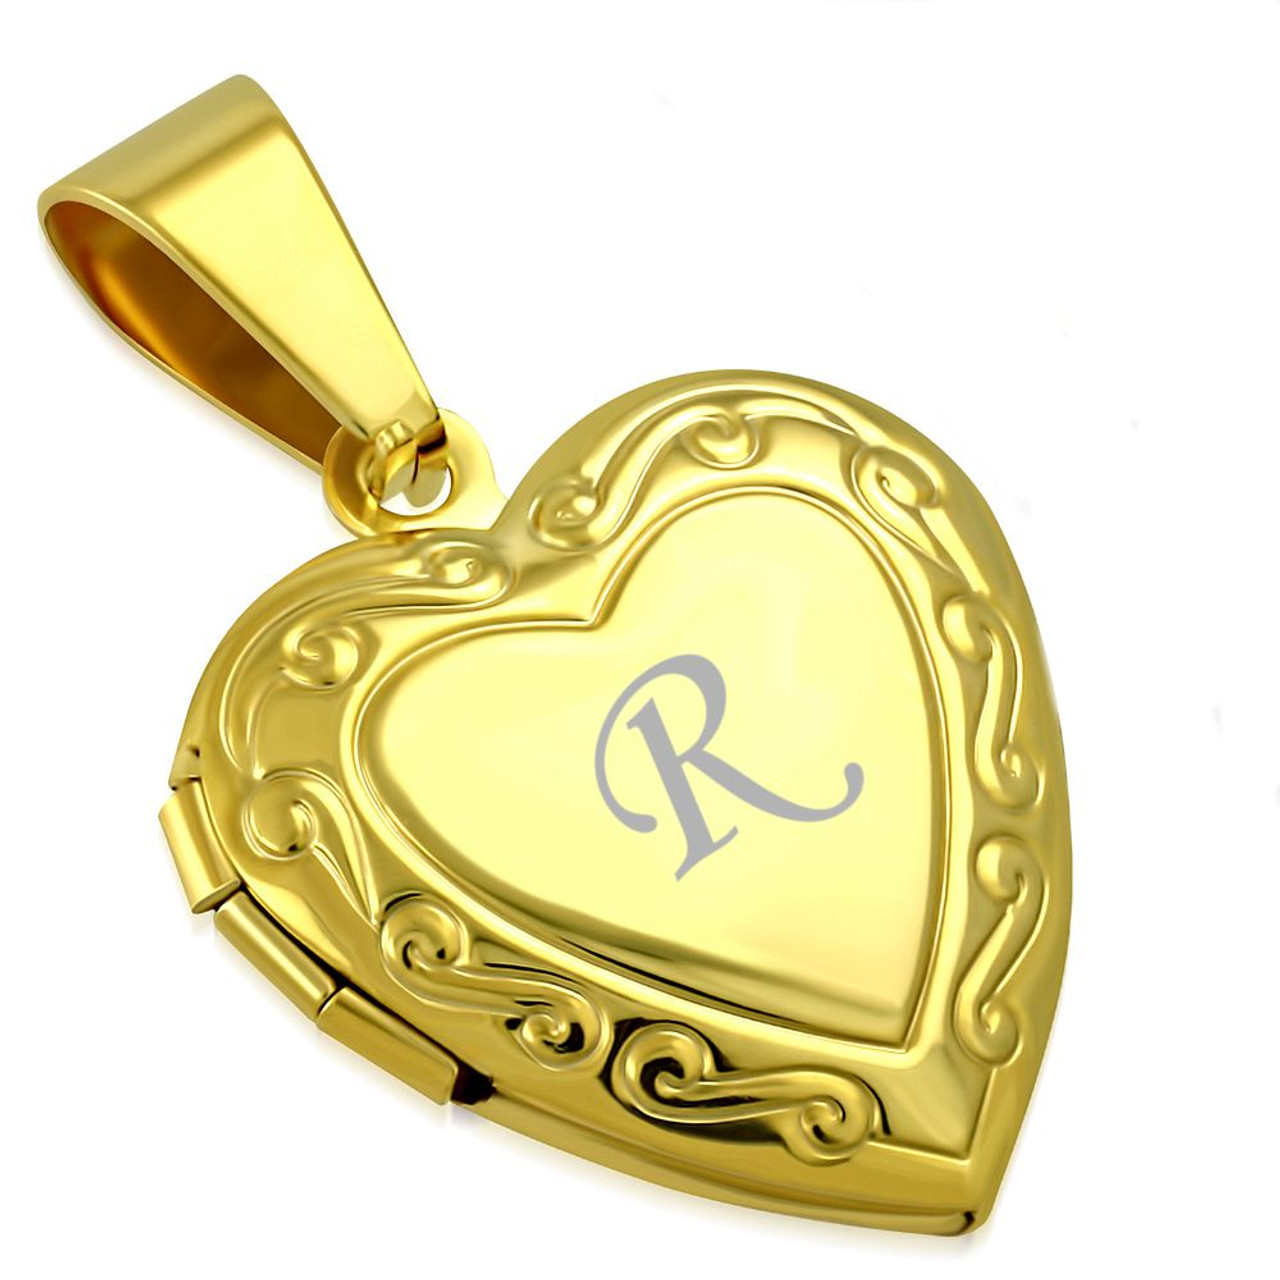 Heart Locket Keychain Antique Brass Accessory